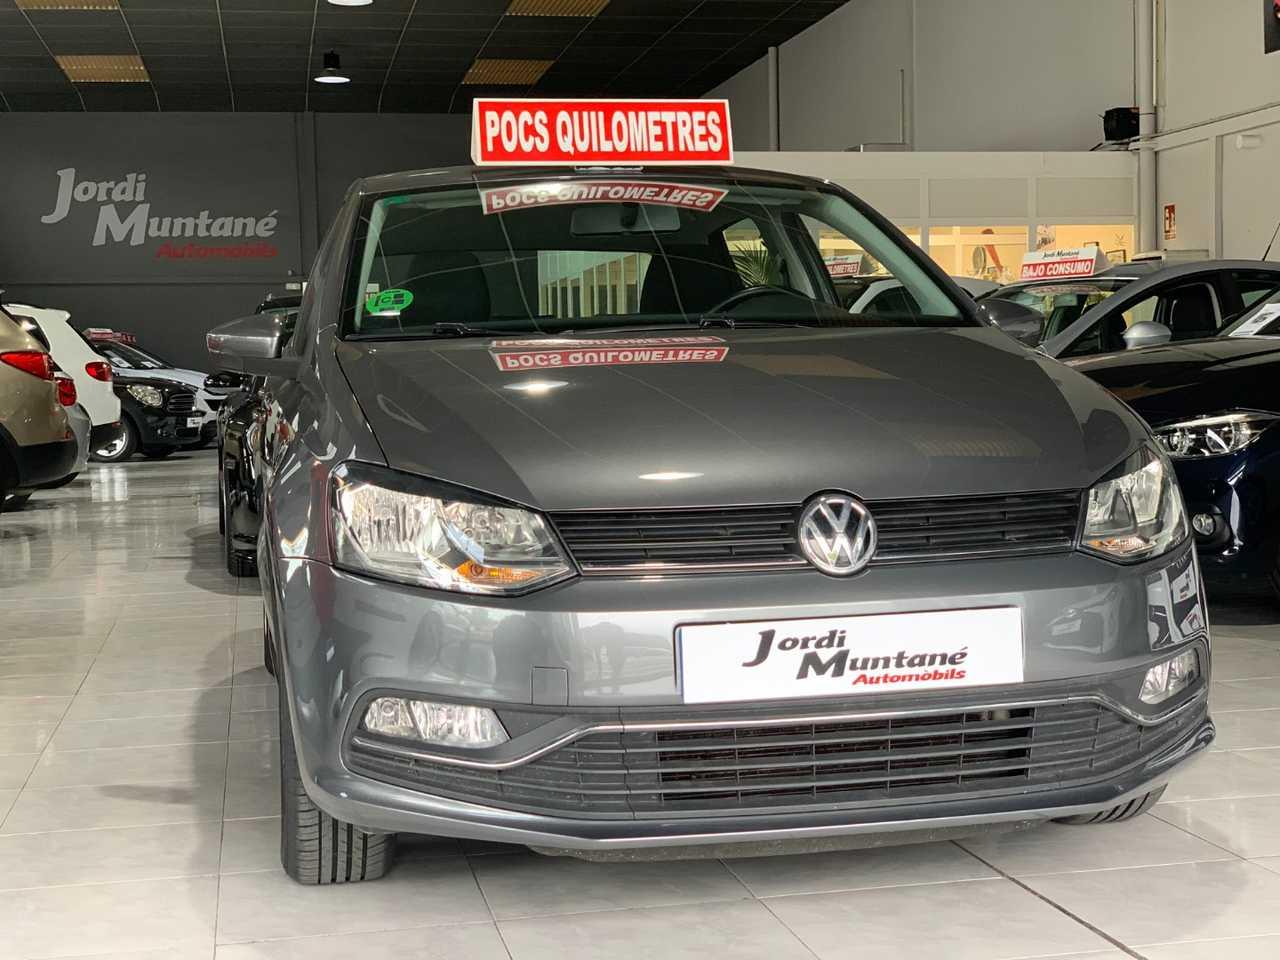 Volkswagen Polo 1.2 TSI 90cv -. '' Advance BMT '' .- 5 puertas -.   - Foto 1